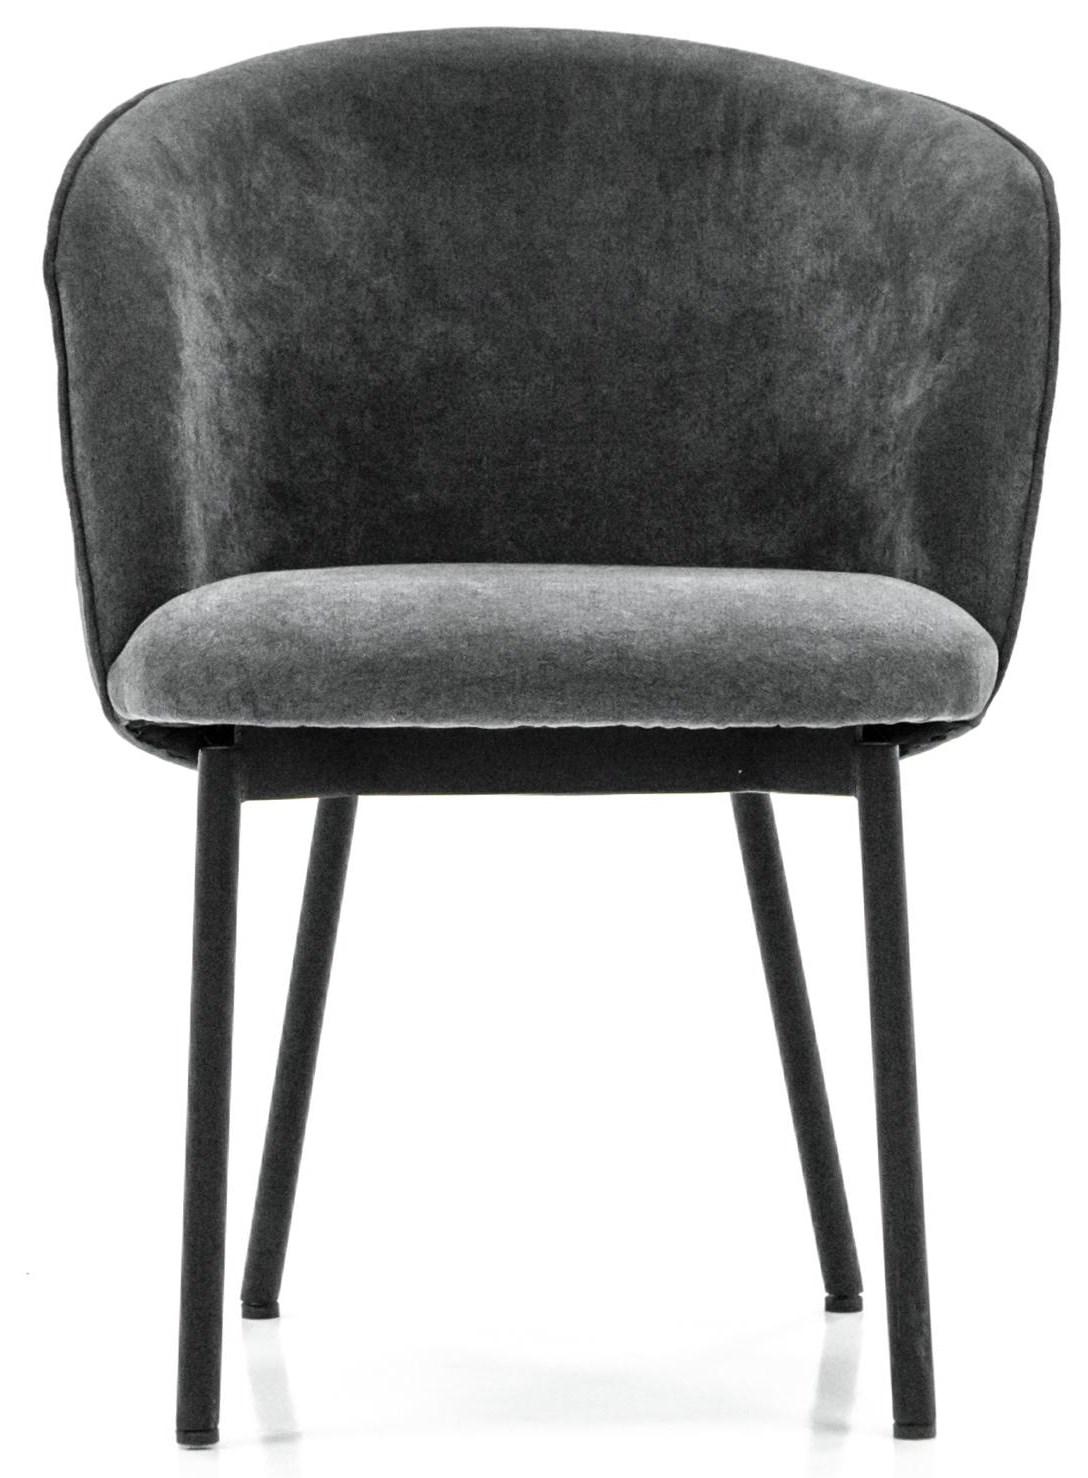 Kalyst Dining Chair by Design Evolution at HomeWorld Furniture